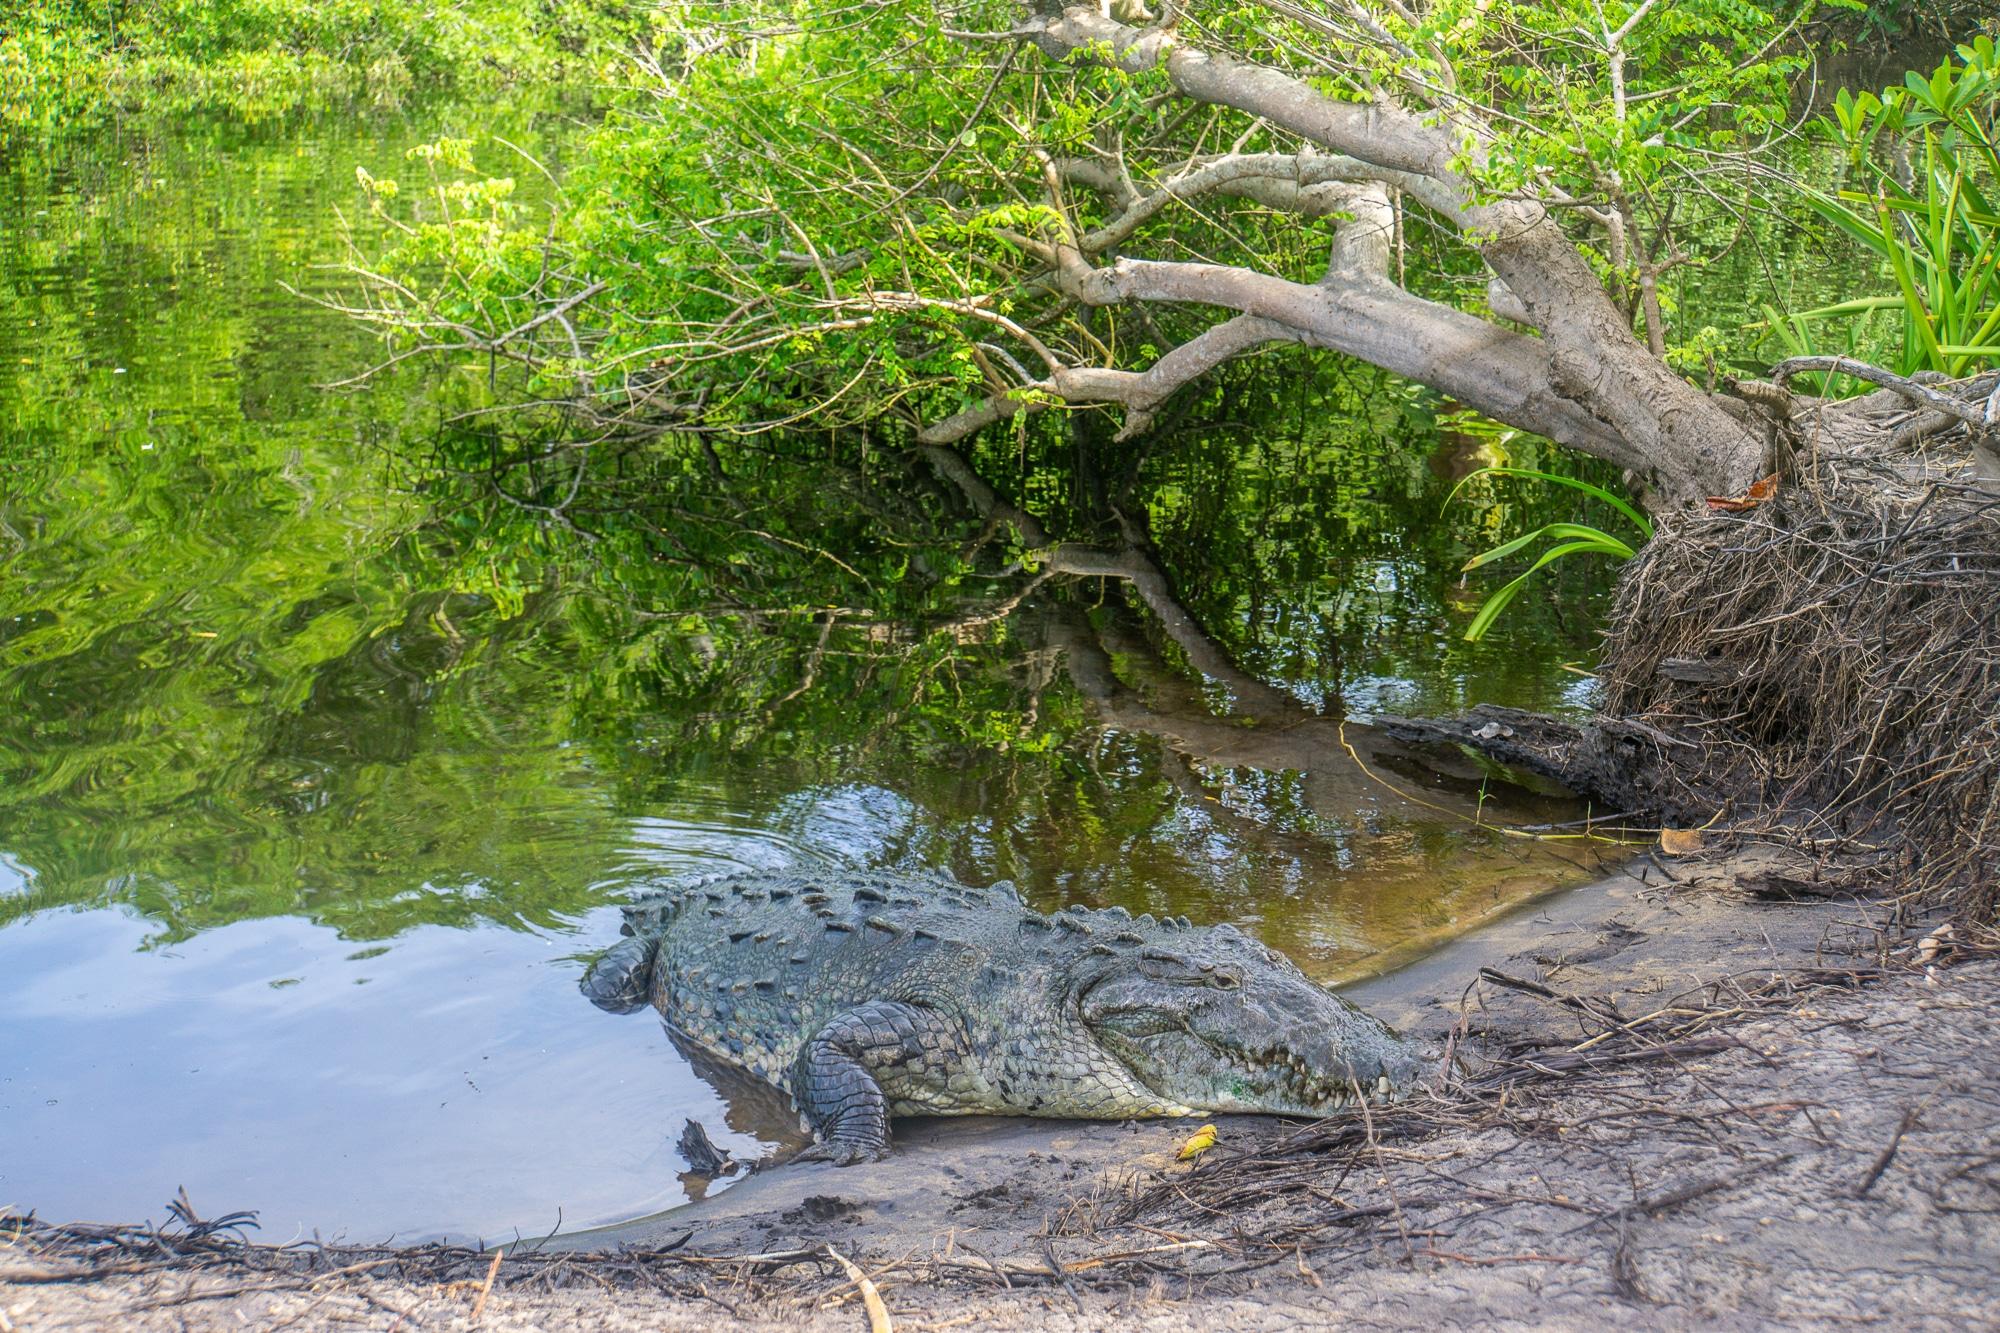 Laguna Ventanilla: Krokodile, Iguanas und Vögel beobachten in Mazunte - Krokodil